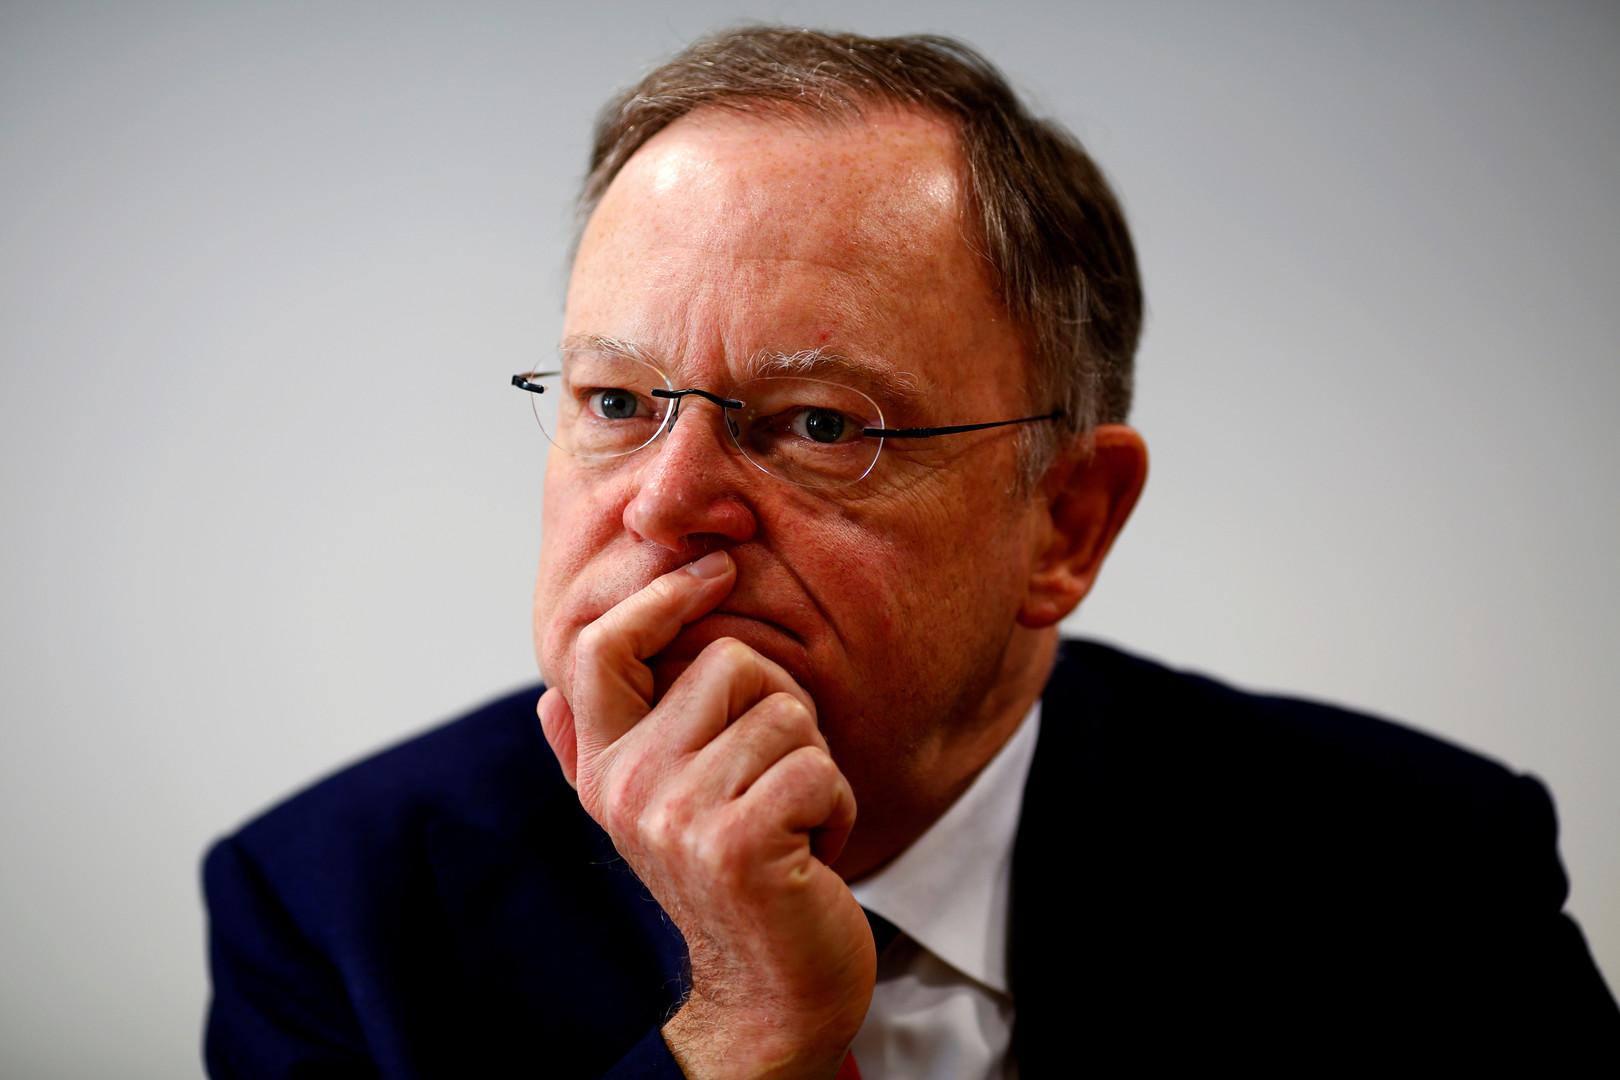 Kurzportäts: Niedersachsens Spitzenkandidaten bei der Landtagswahl